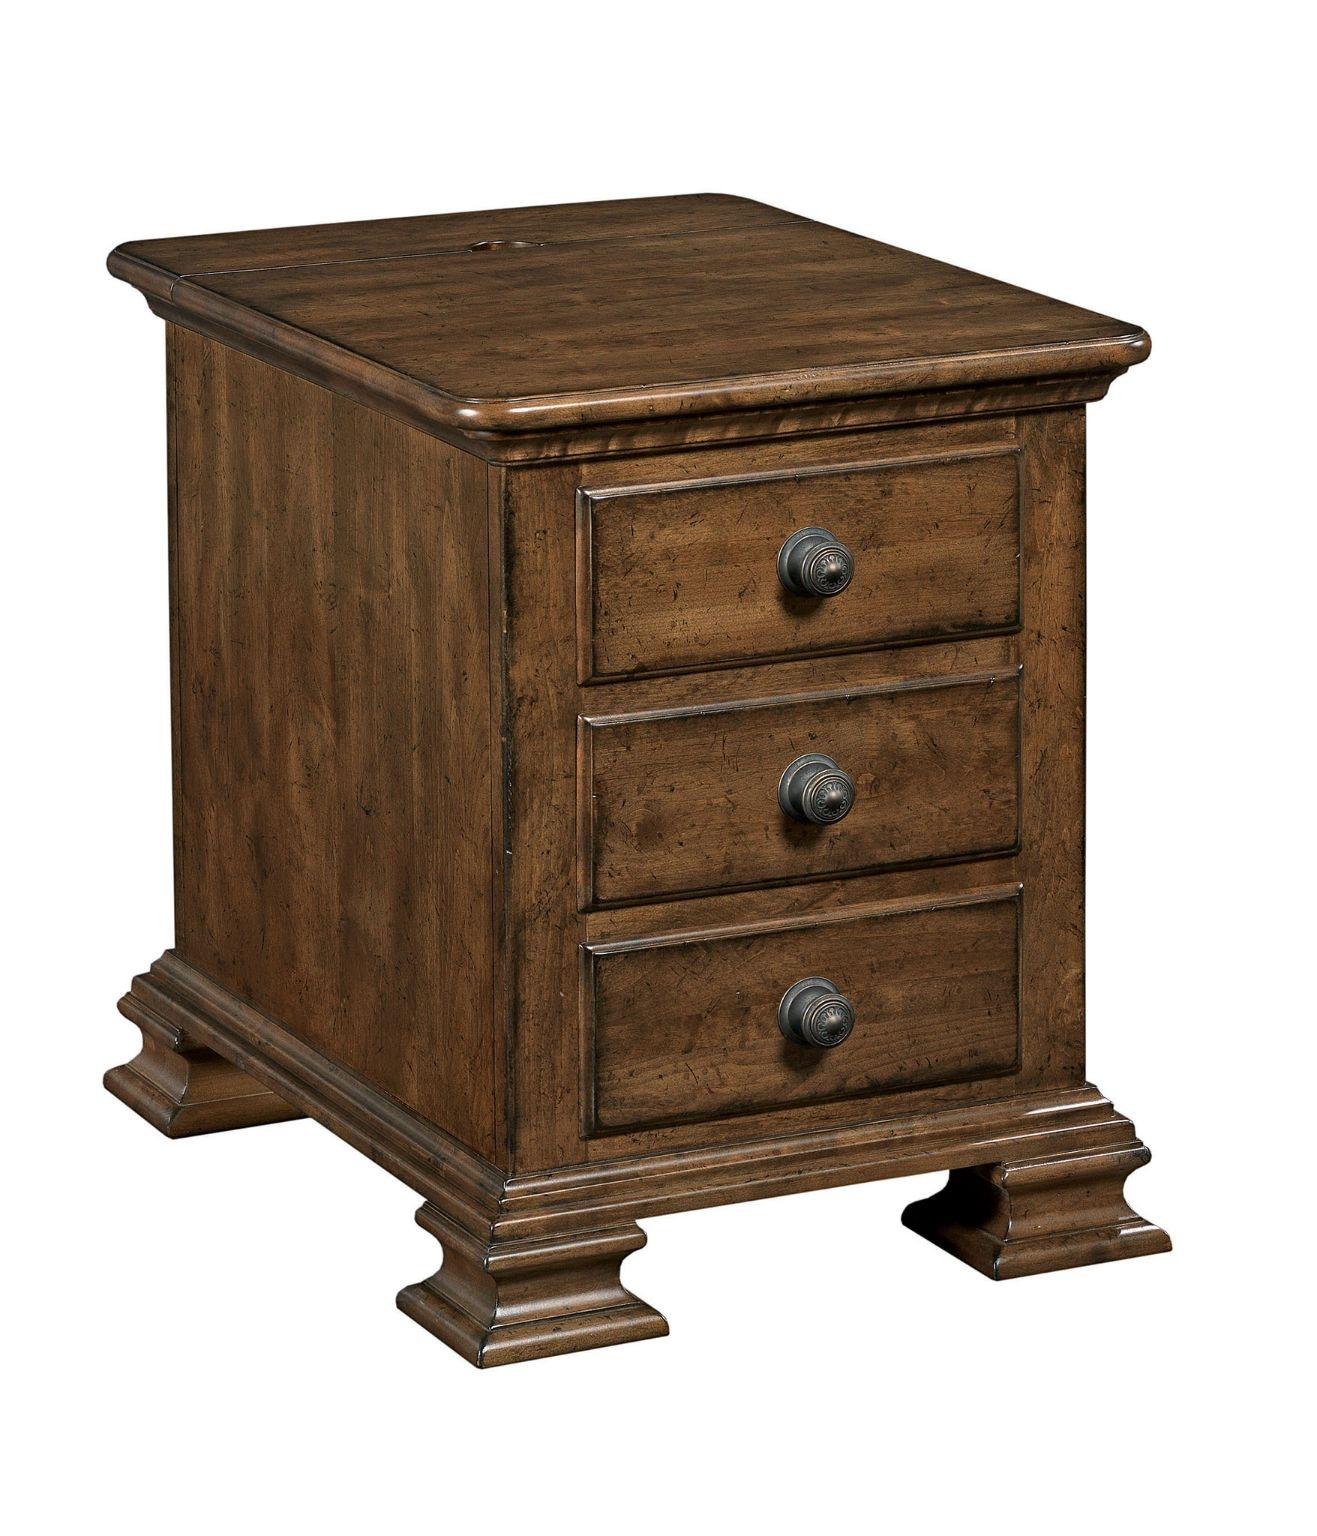 Kincaid Furniture Chairside Table 95 026 ...